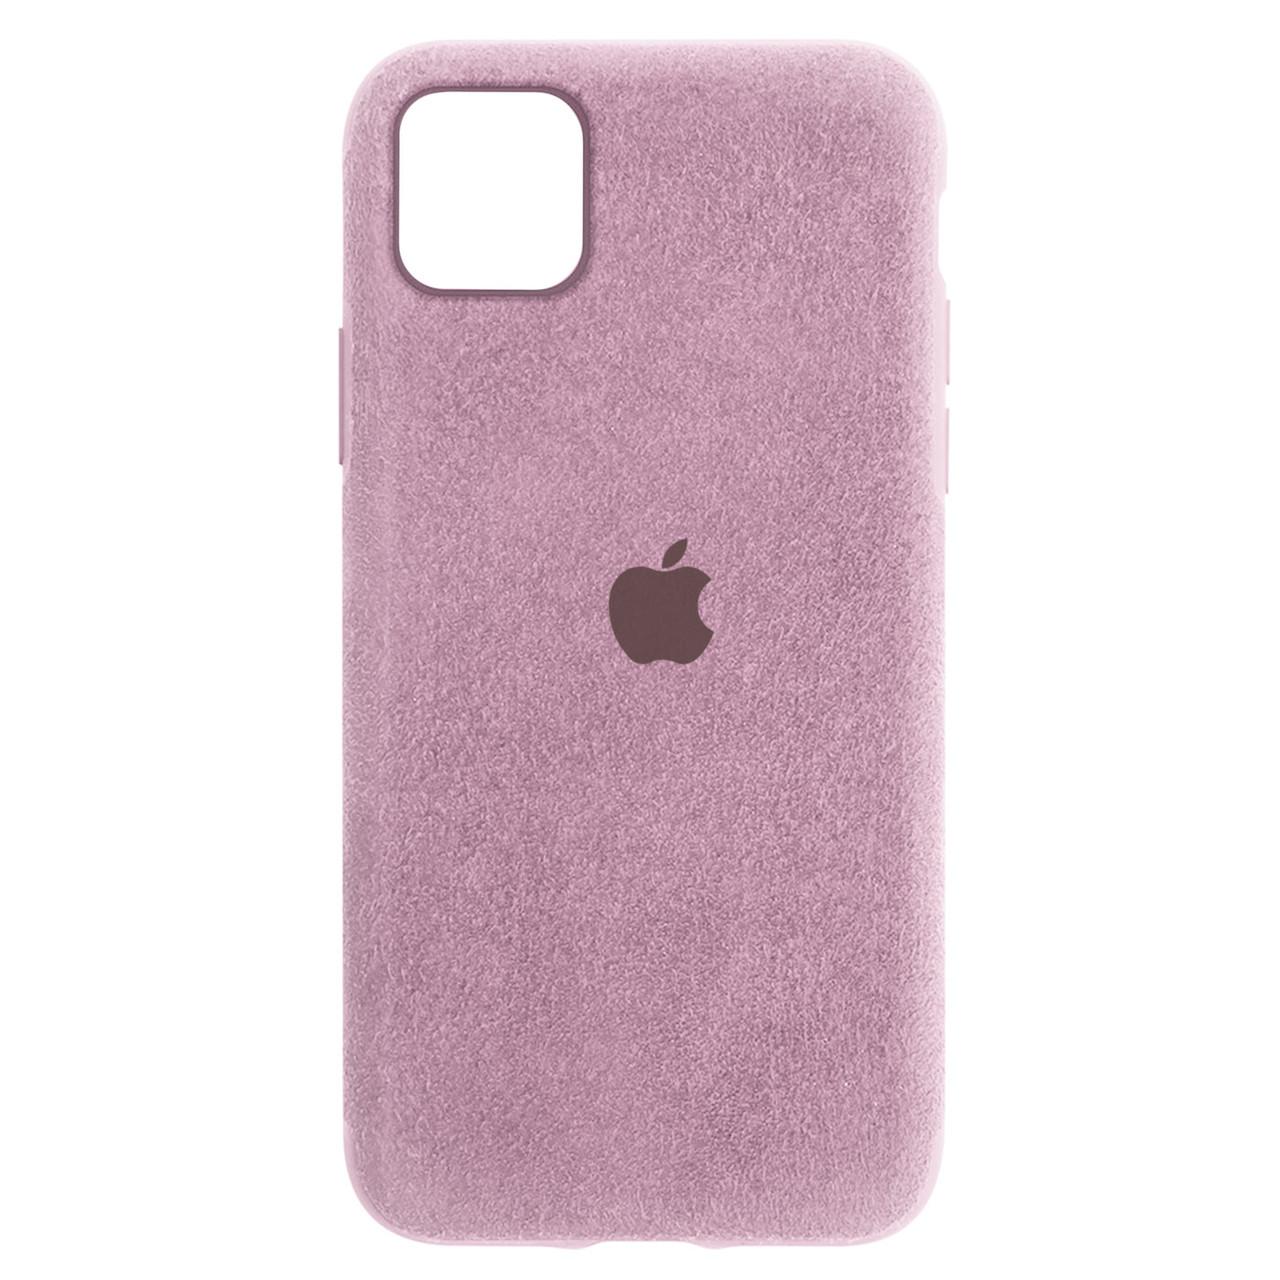 Чехол для Apple iPhone 11 Pro Max (6.5*) back cover Alcantara Cover Pink